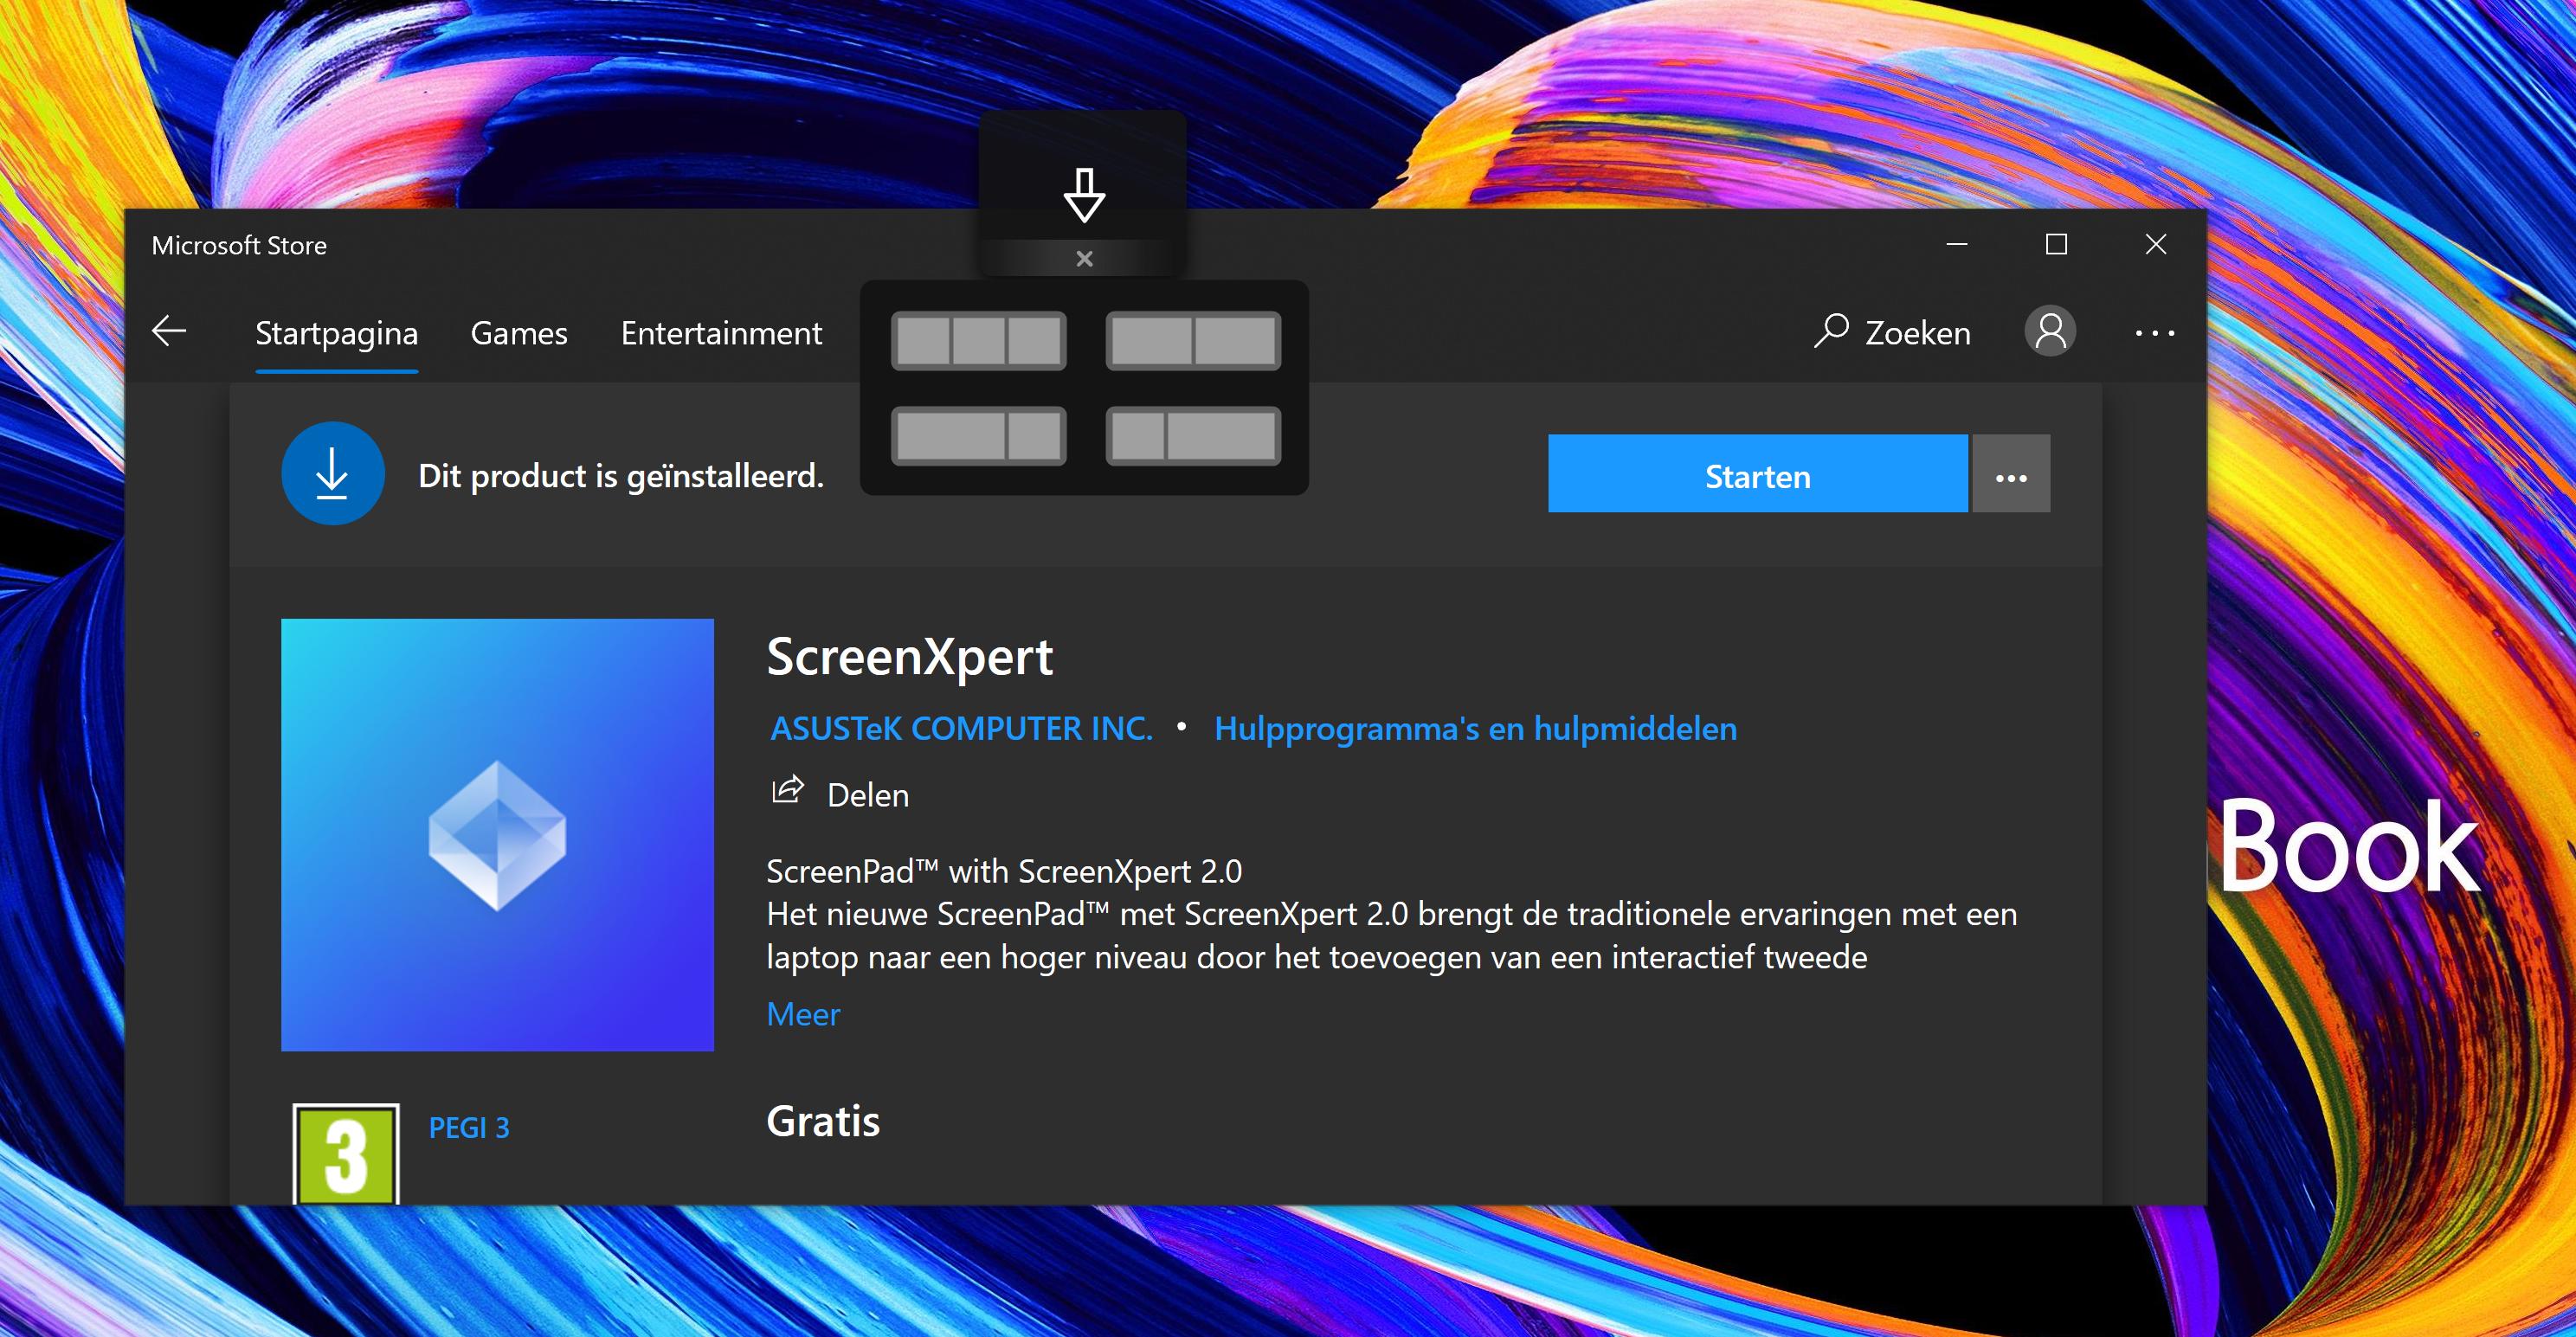 screen xpert Asus venster slepen